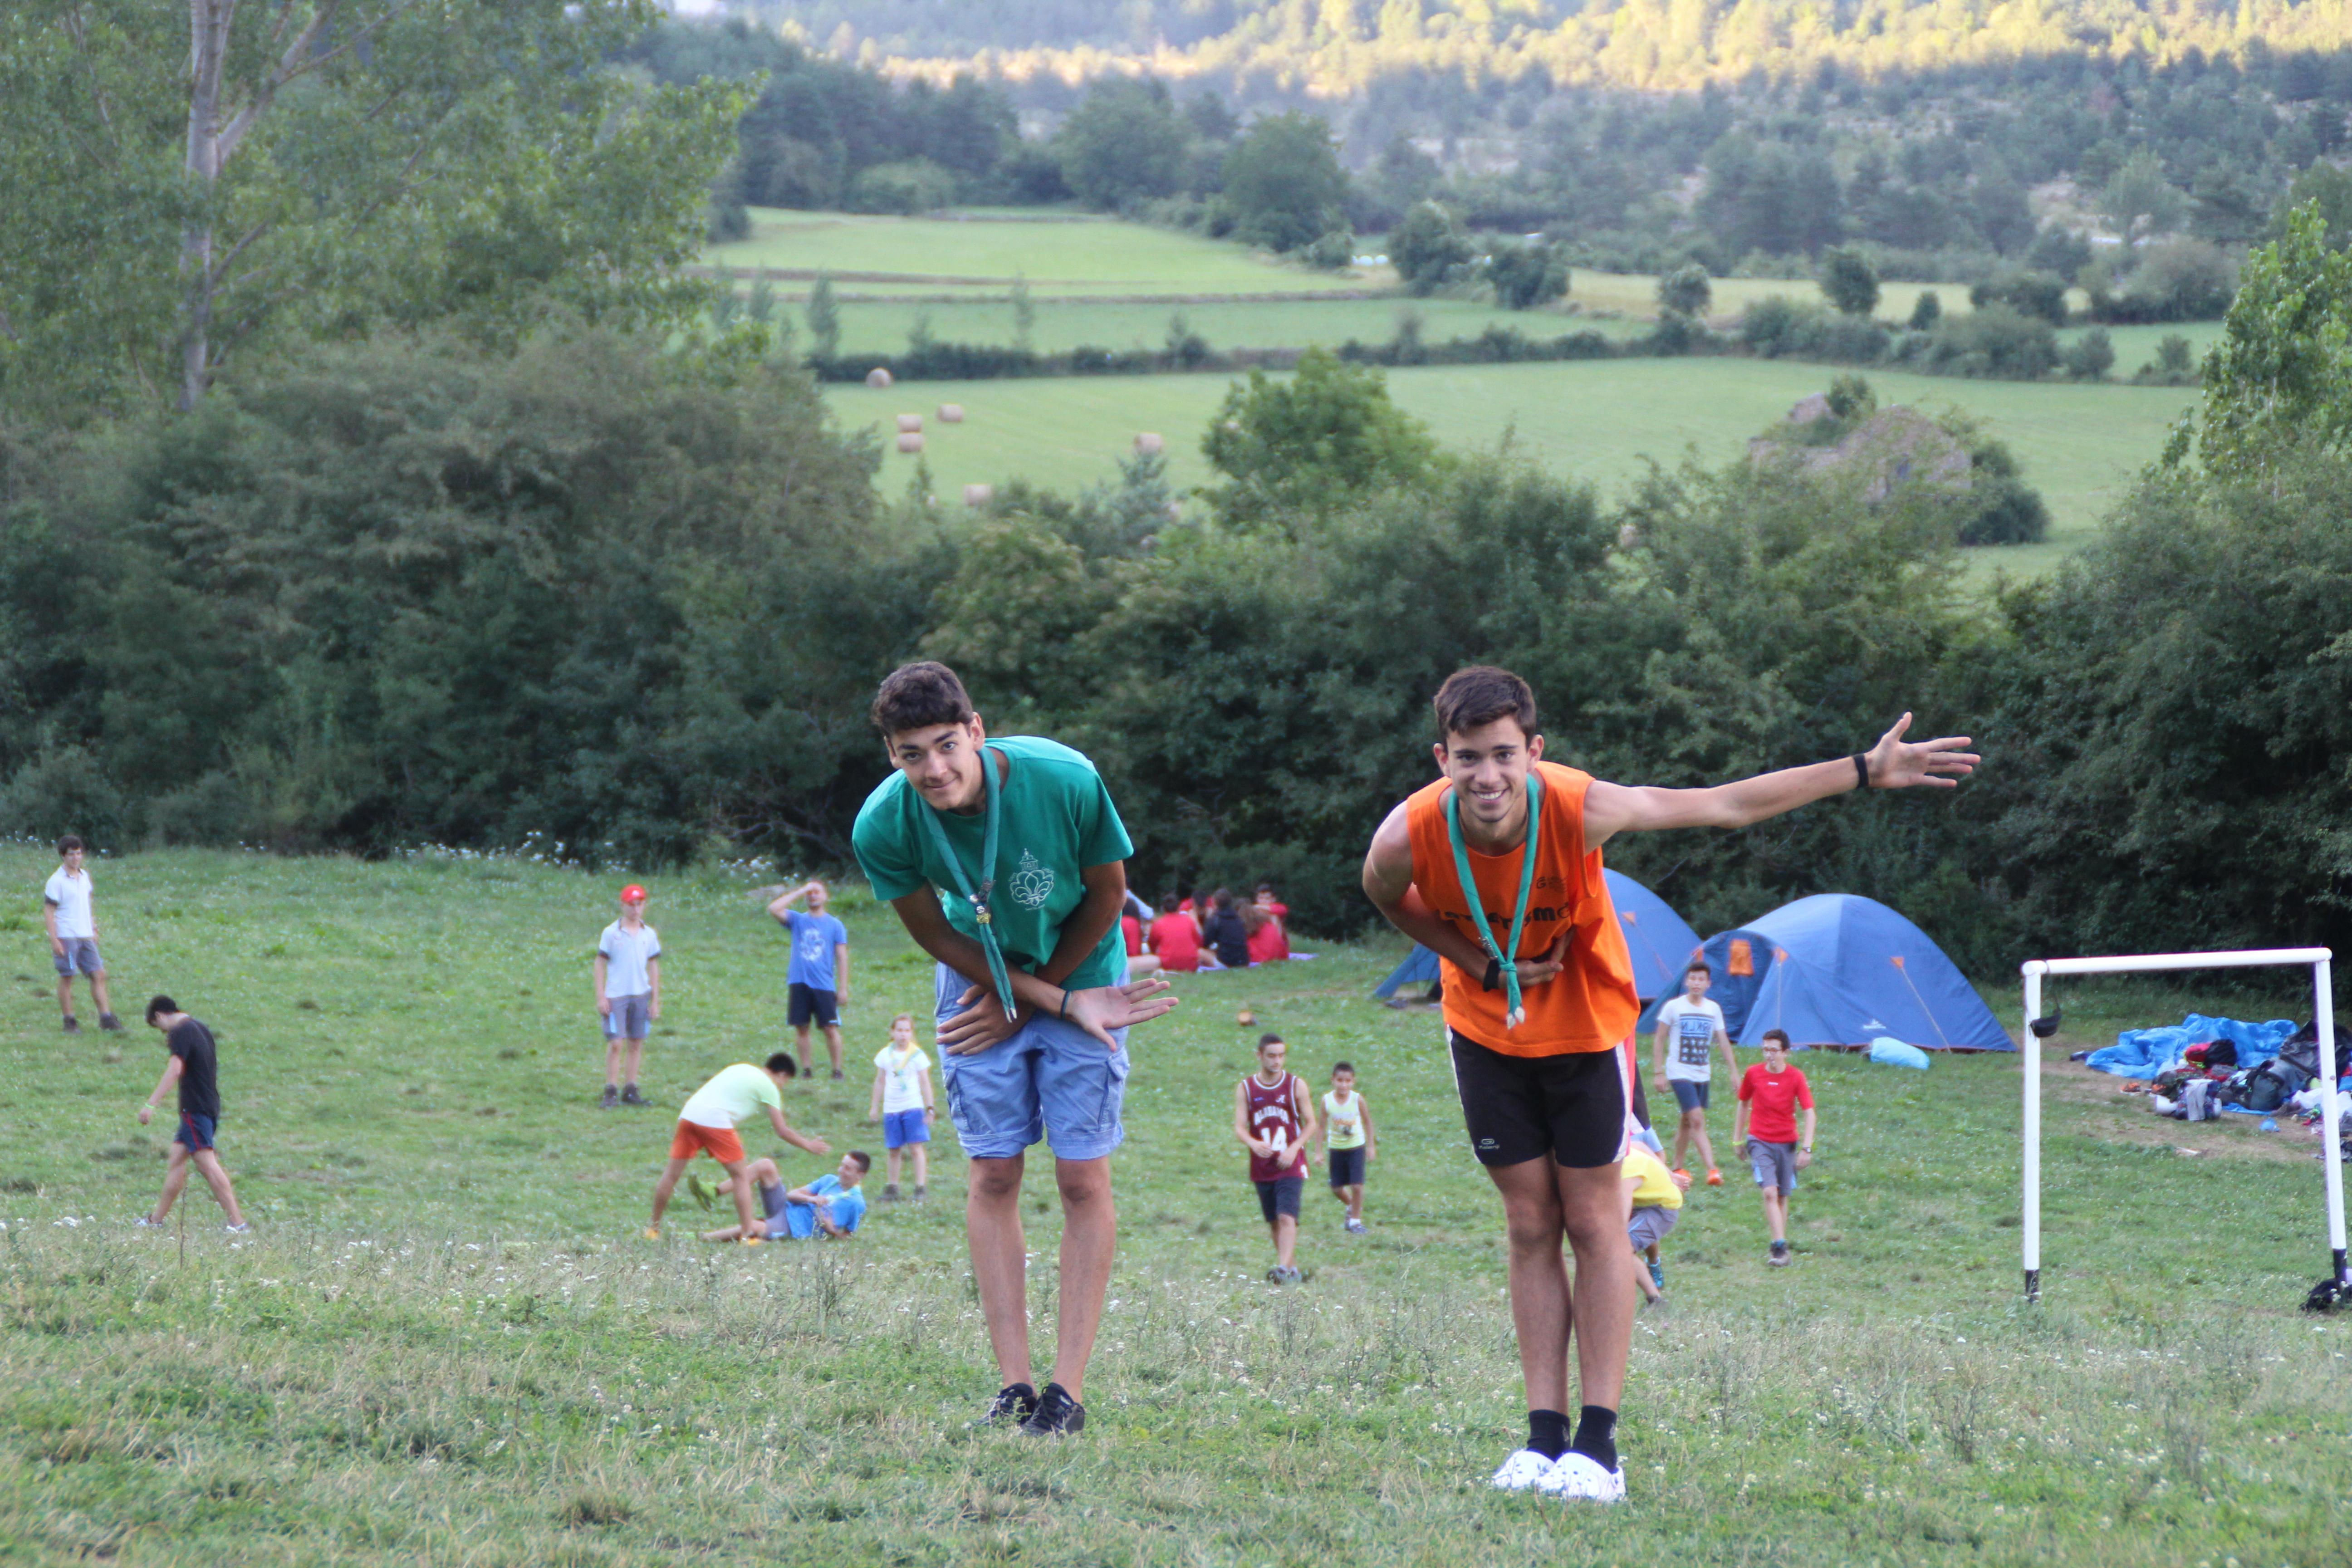 15-16 - Grupo - Campamento de verano - P254